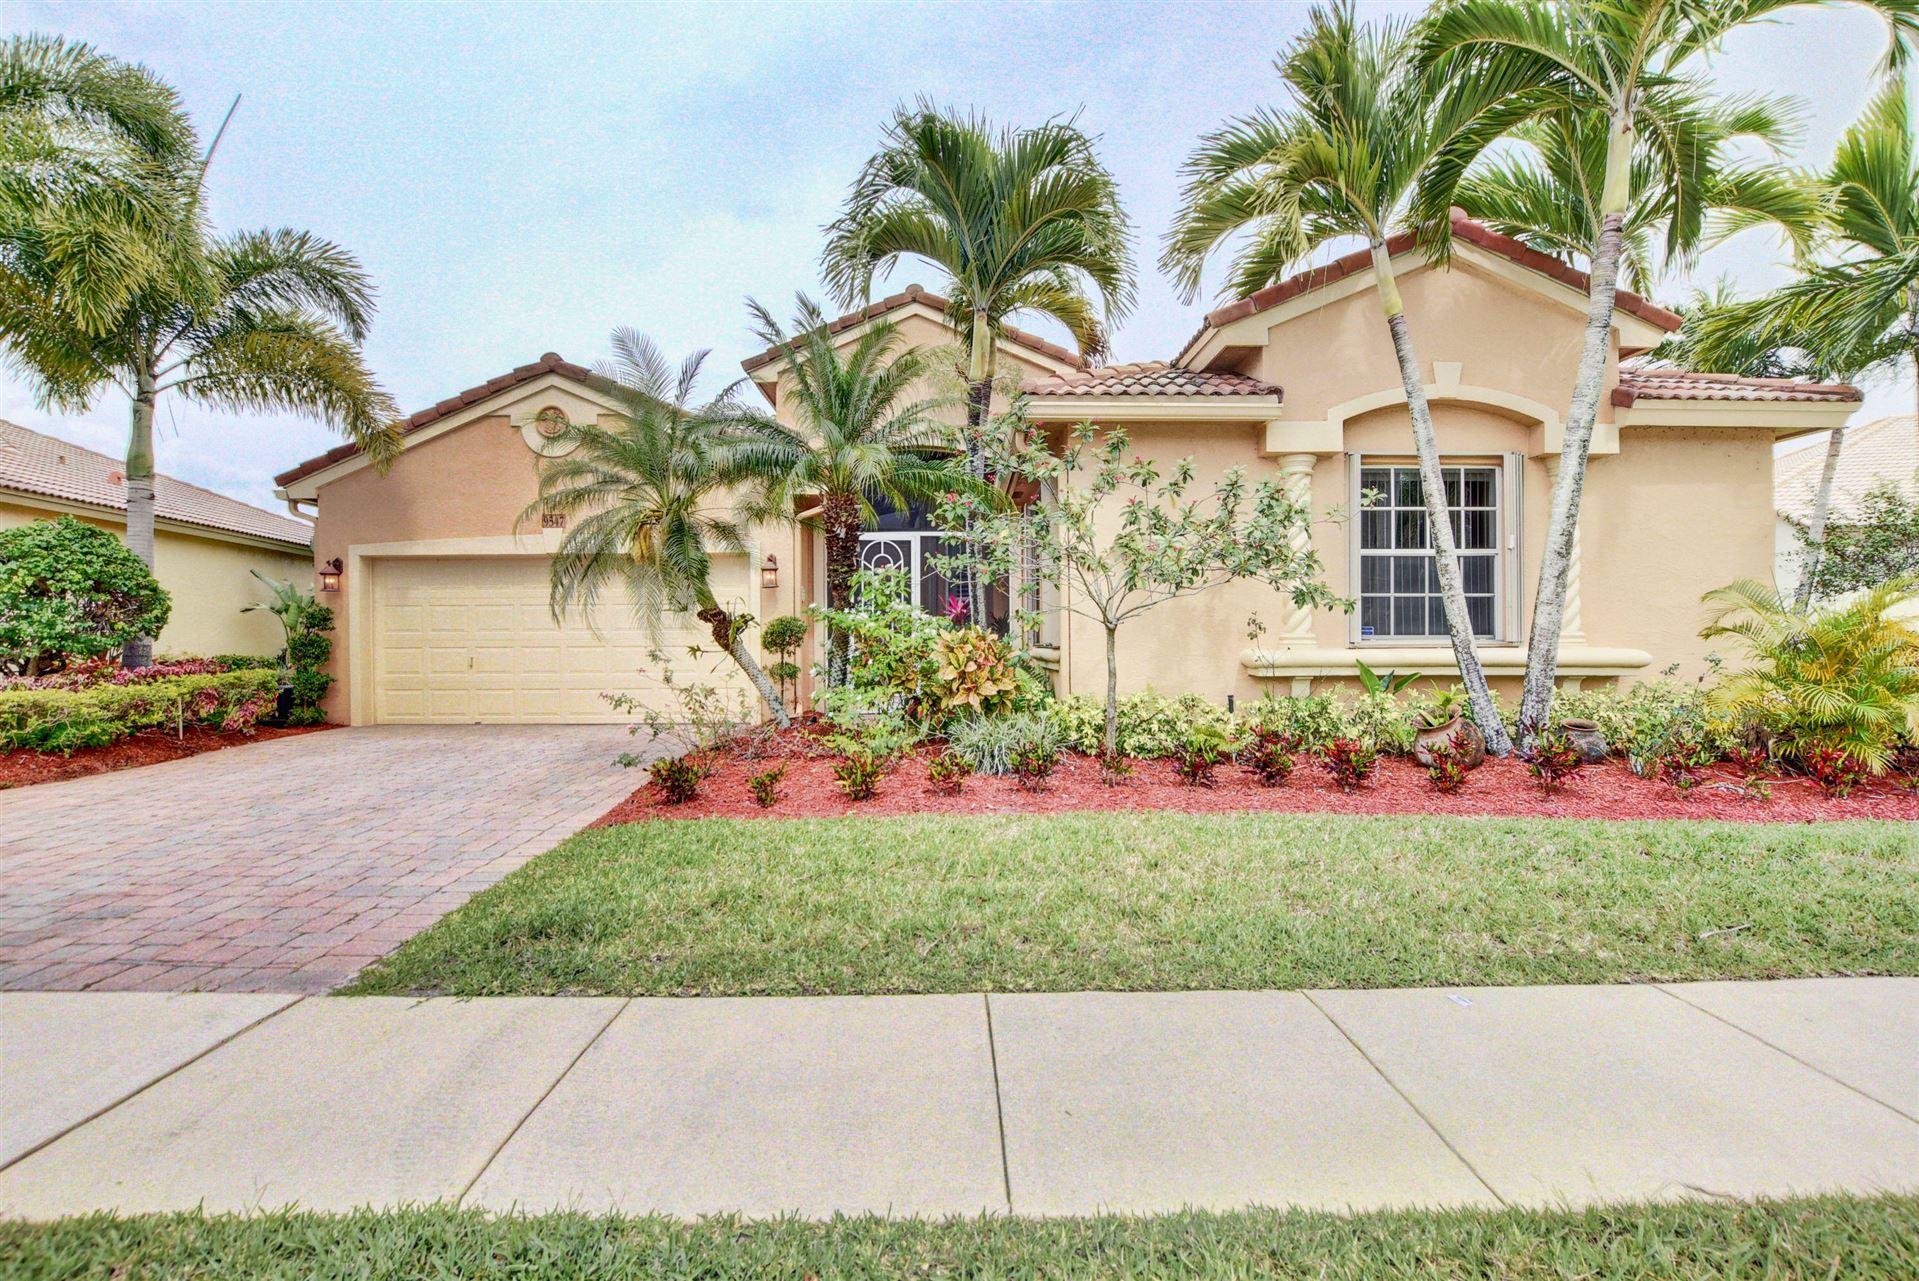 9547 Lantern Bay Circle, West Palm Beach, FL 33411 - #: RX-10627527